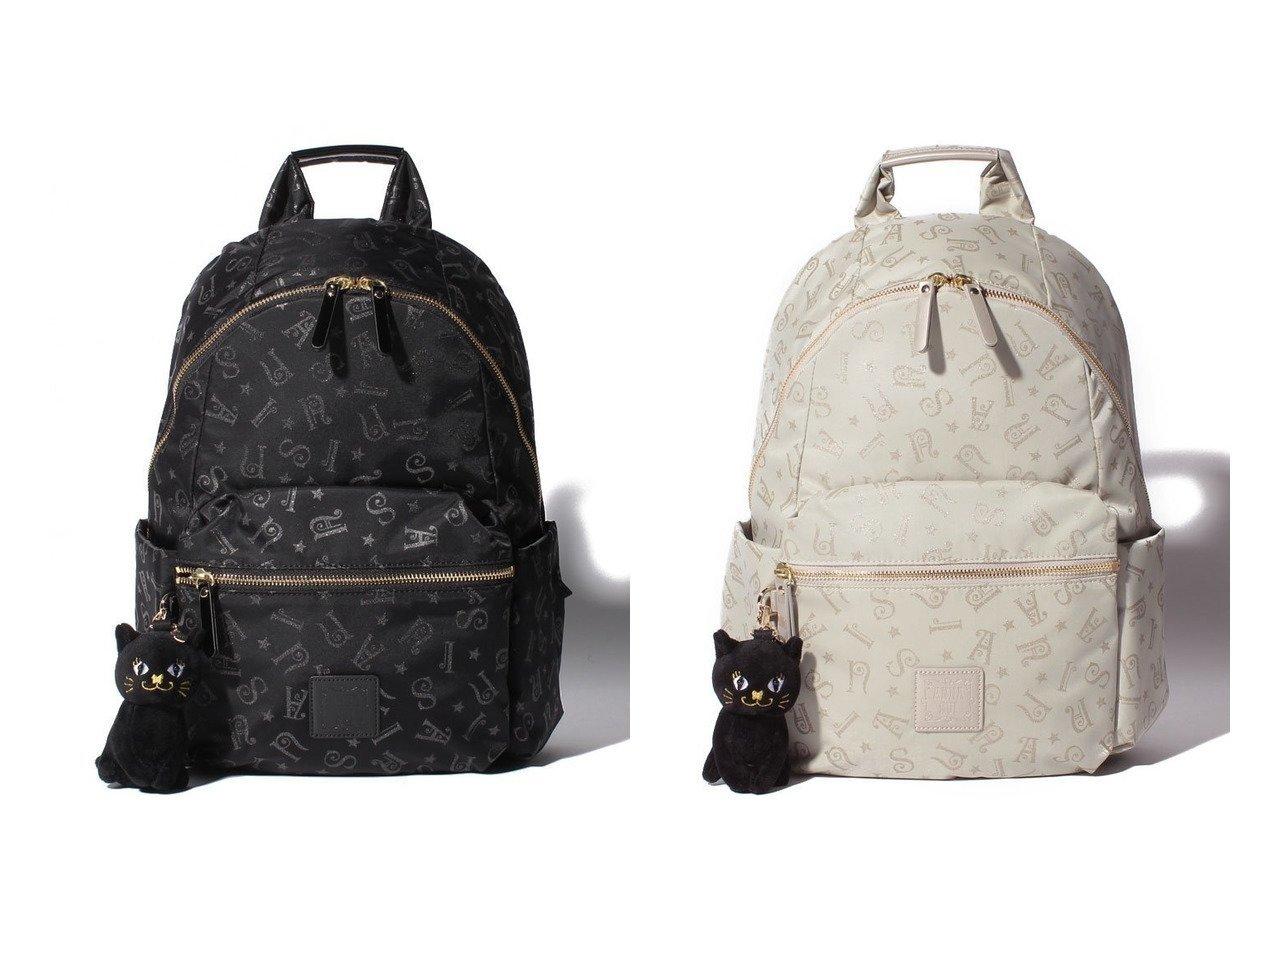 【ANNA SUI/アナスイ】のホーリー リュック 【バッグ・鞄】おすすめ!人気、トレンド・レディースファッションの通販  | レディースファッション・服の通販 founy(ファニー)